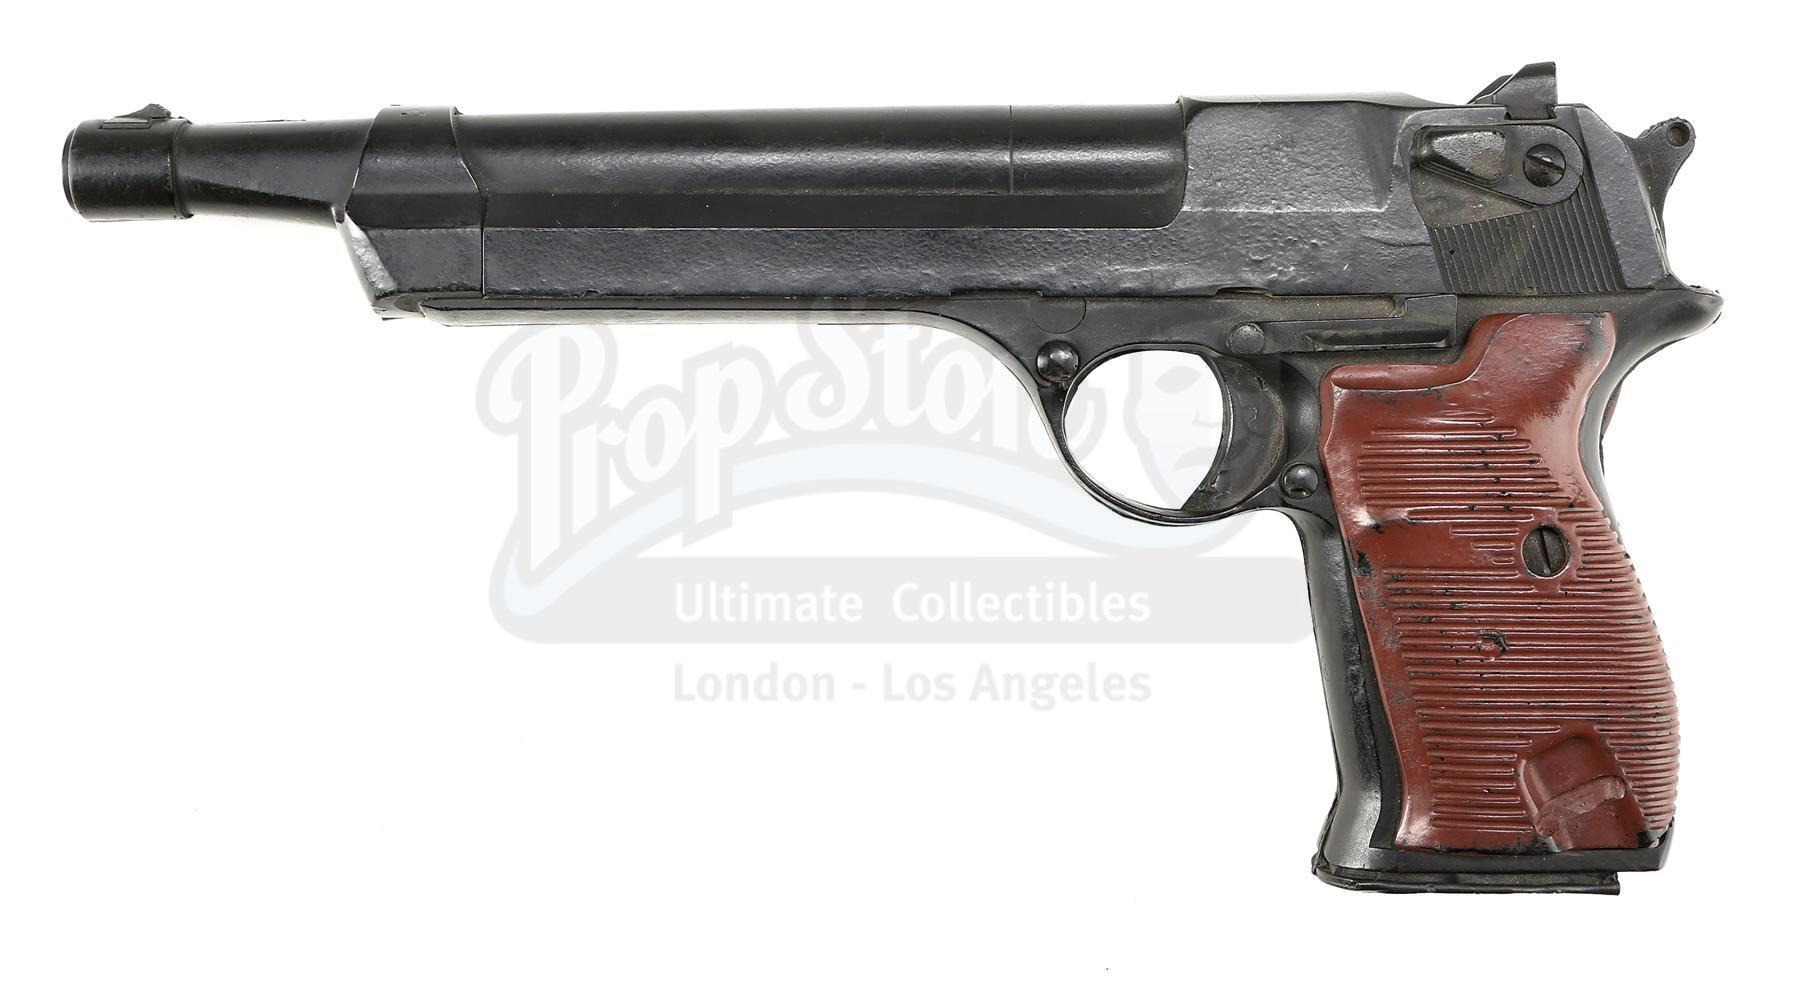 Lot # 979: RED HEAT - Ivan Danko's (Arnold Schwarzenegger) Podbyrin 9.2mm Pistol